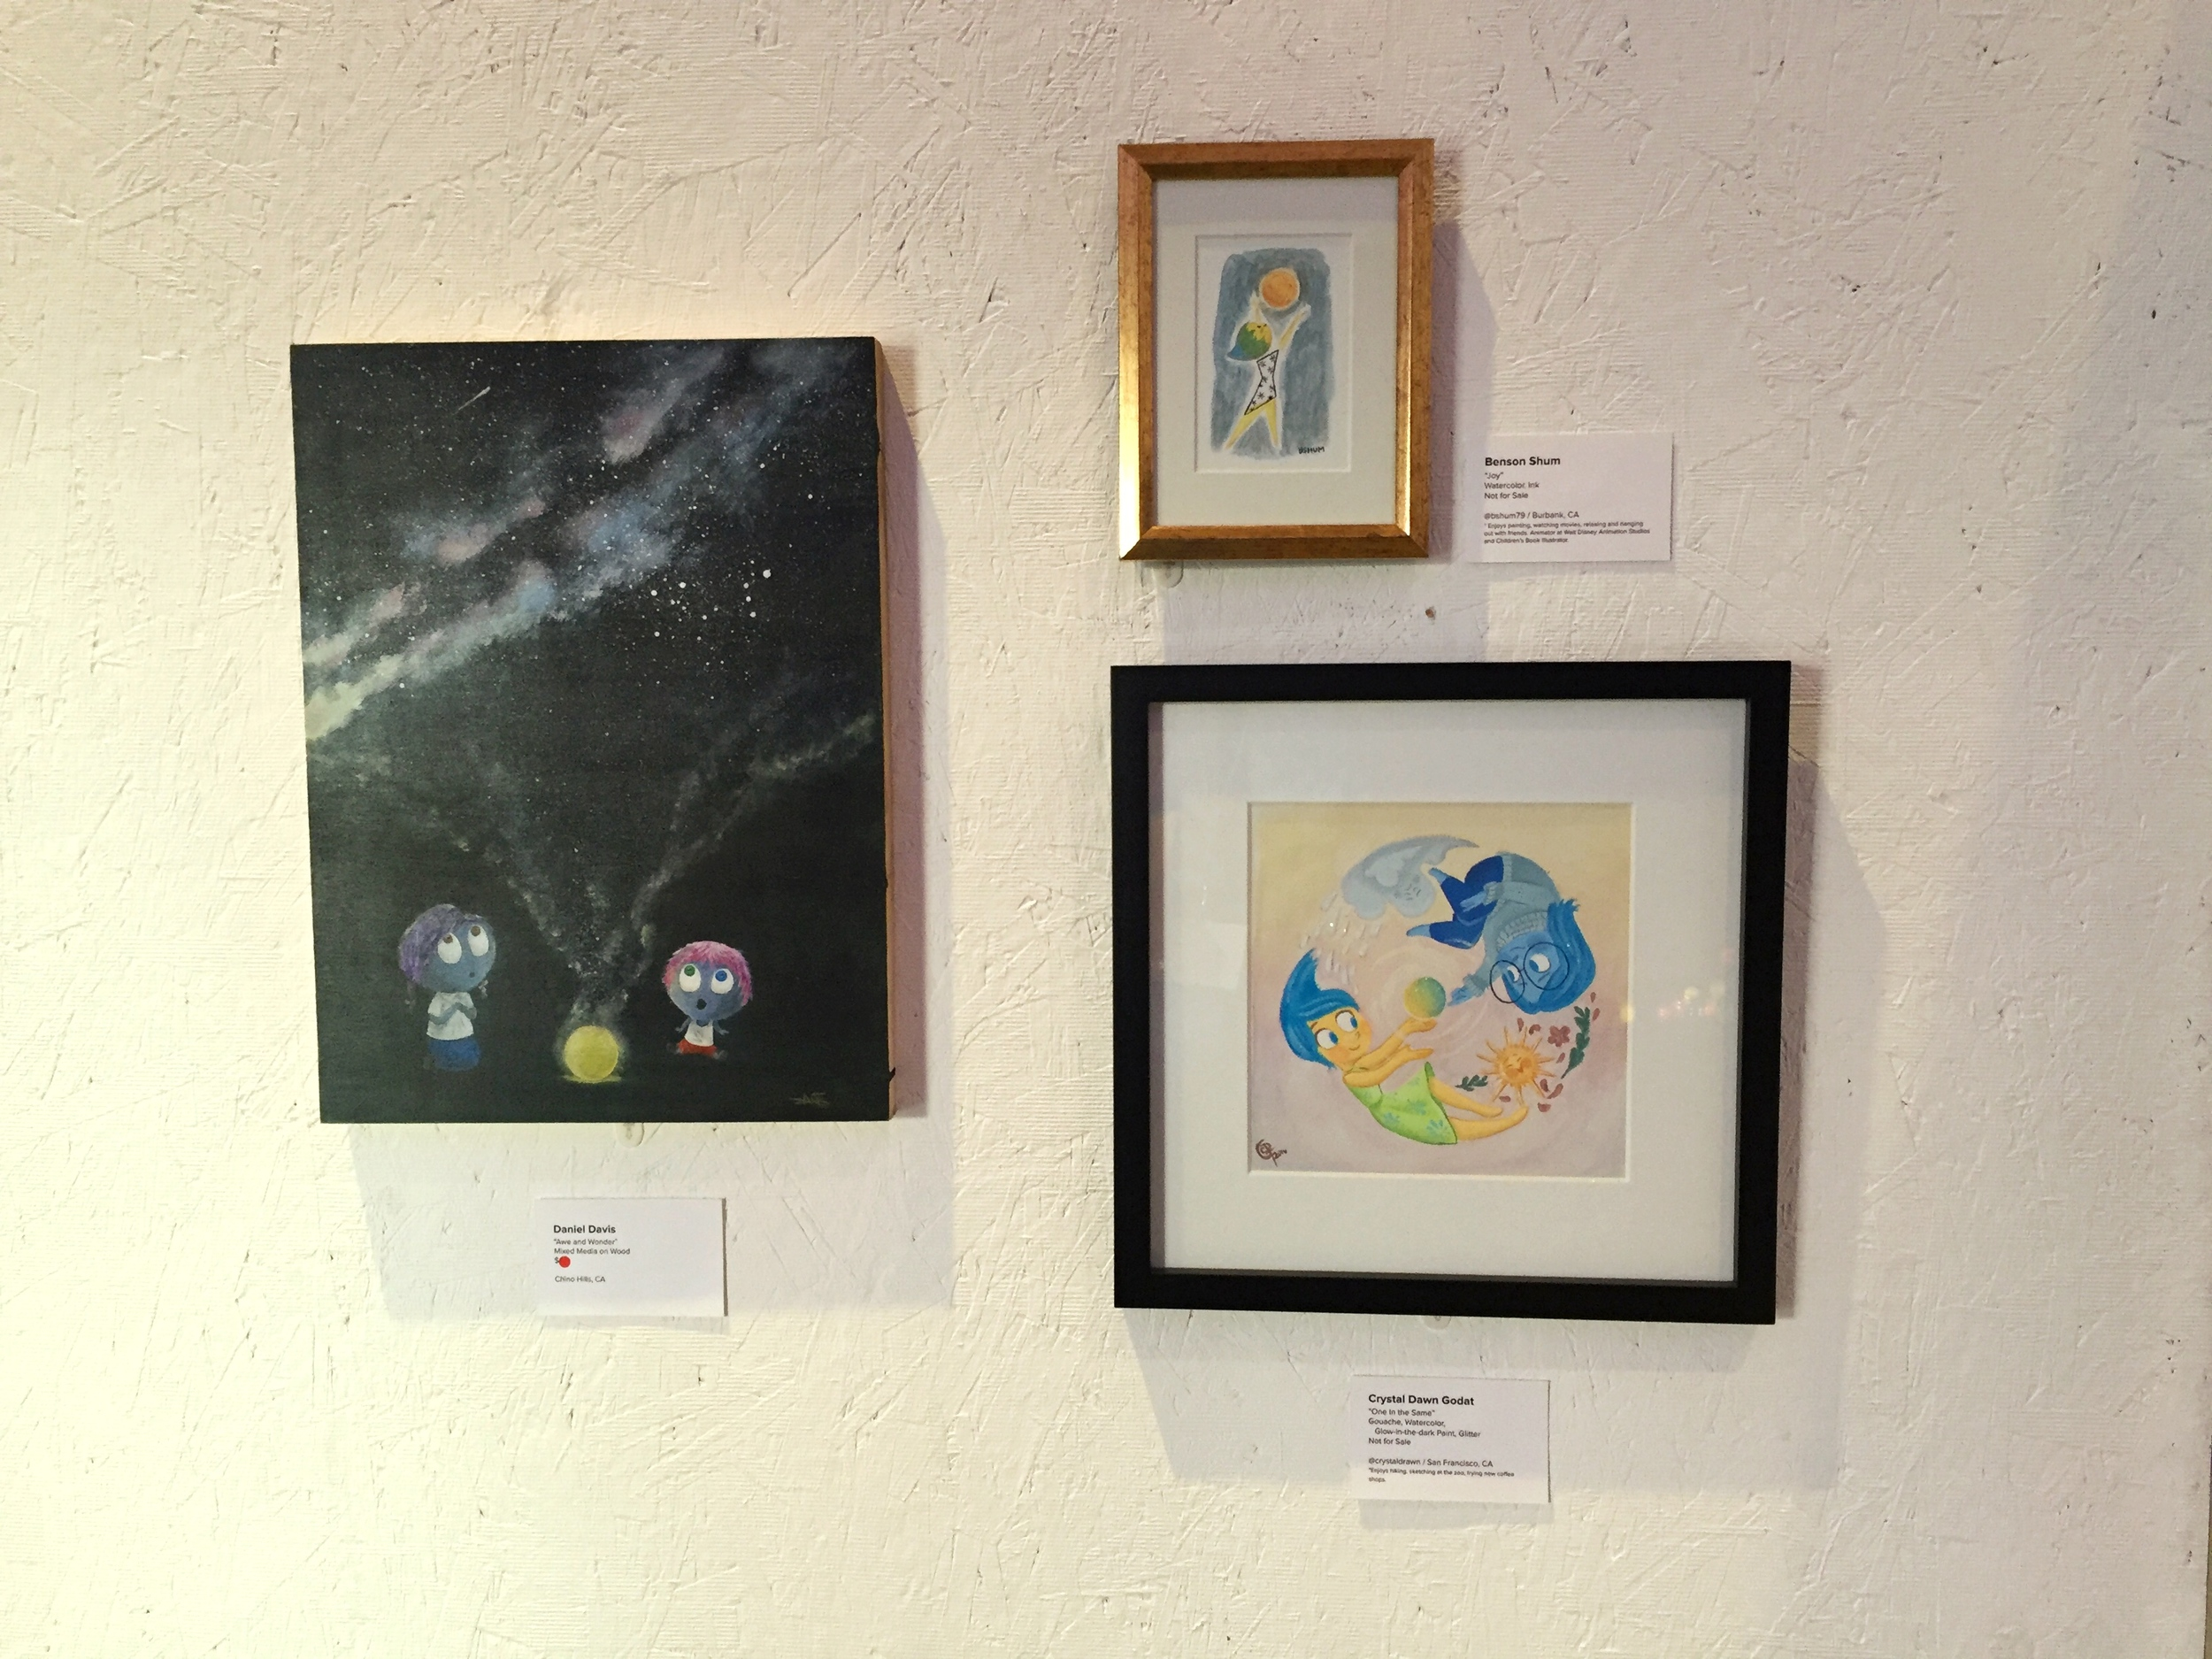 Art by Daniel Davis, Benson Shum, and Crystal Dawn Godat (clockwise).